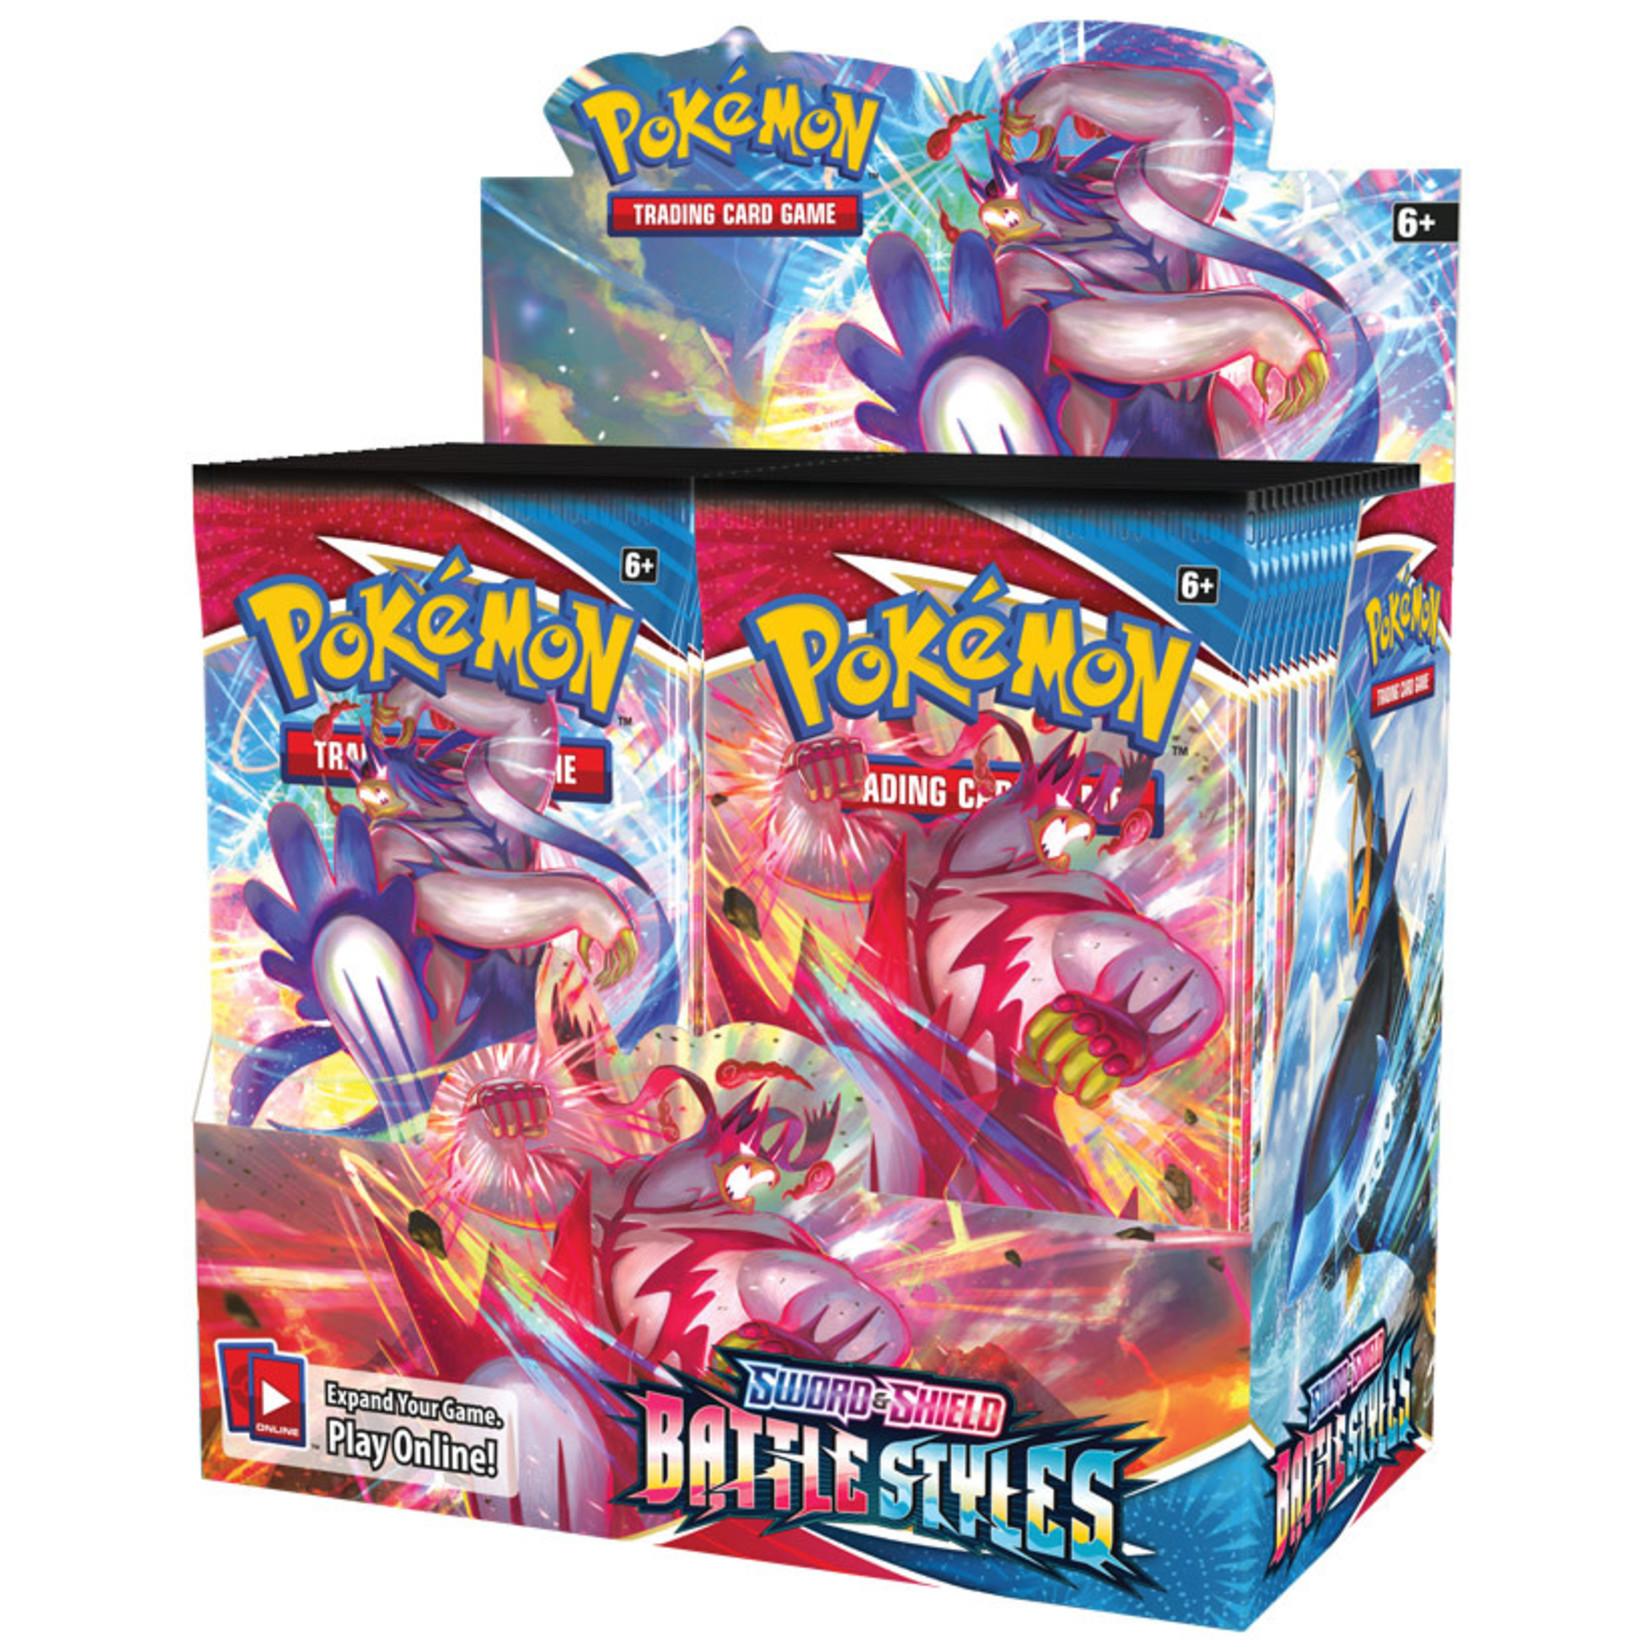 Pokémon Pokémon TCG: Sword & Shield—Battle Styles Booster Box